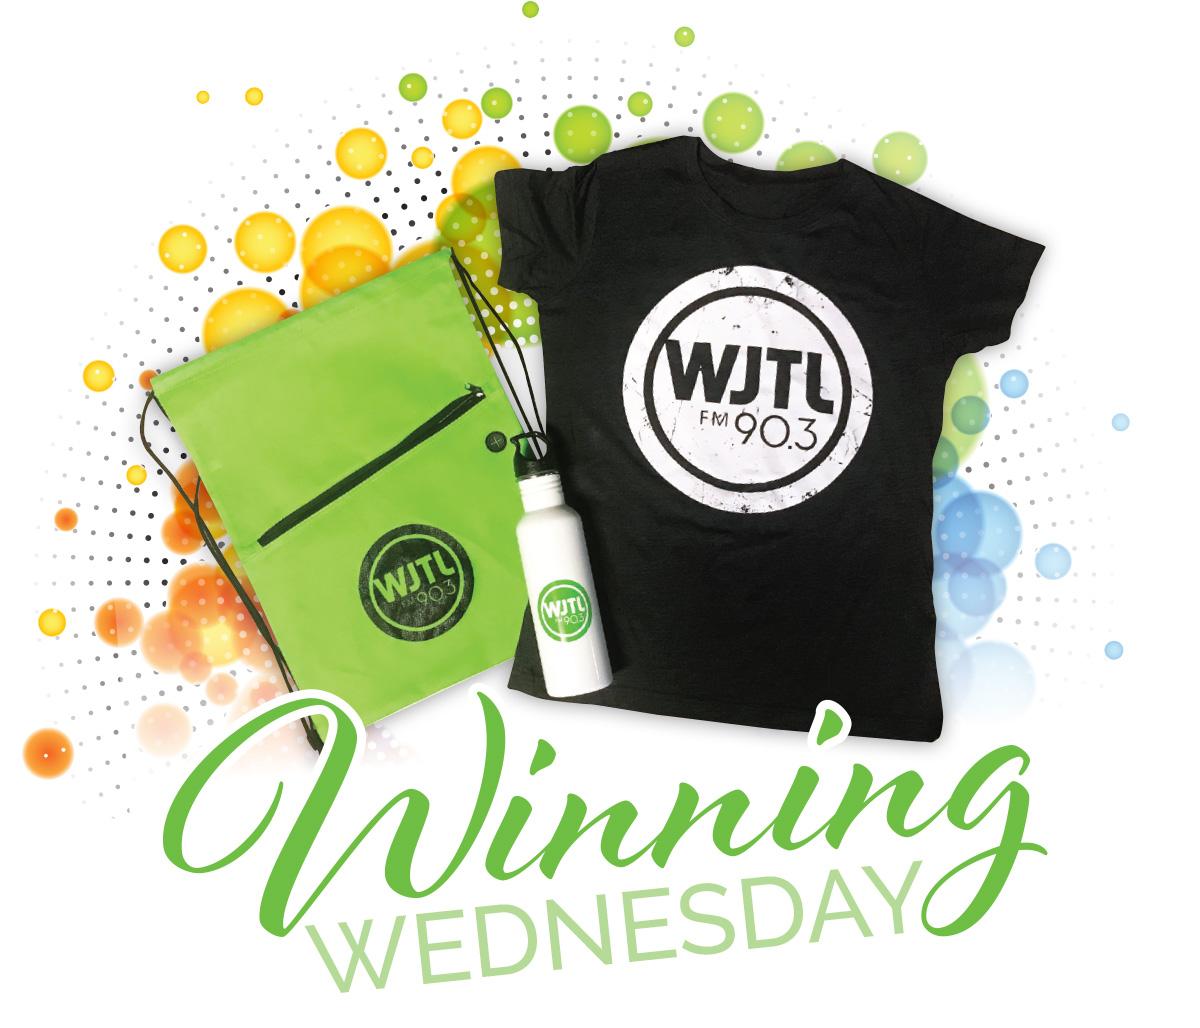 WJTL Prize Pack